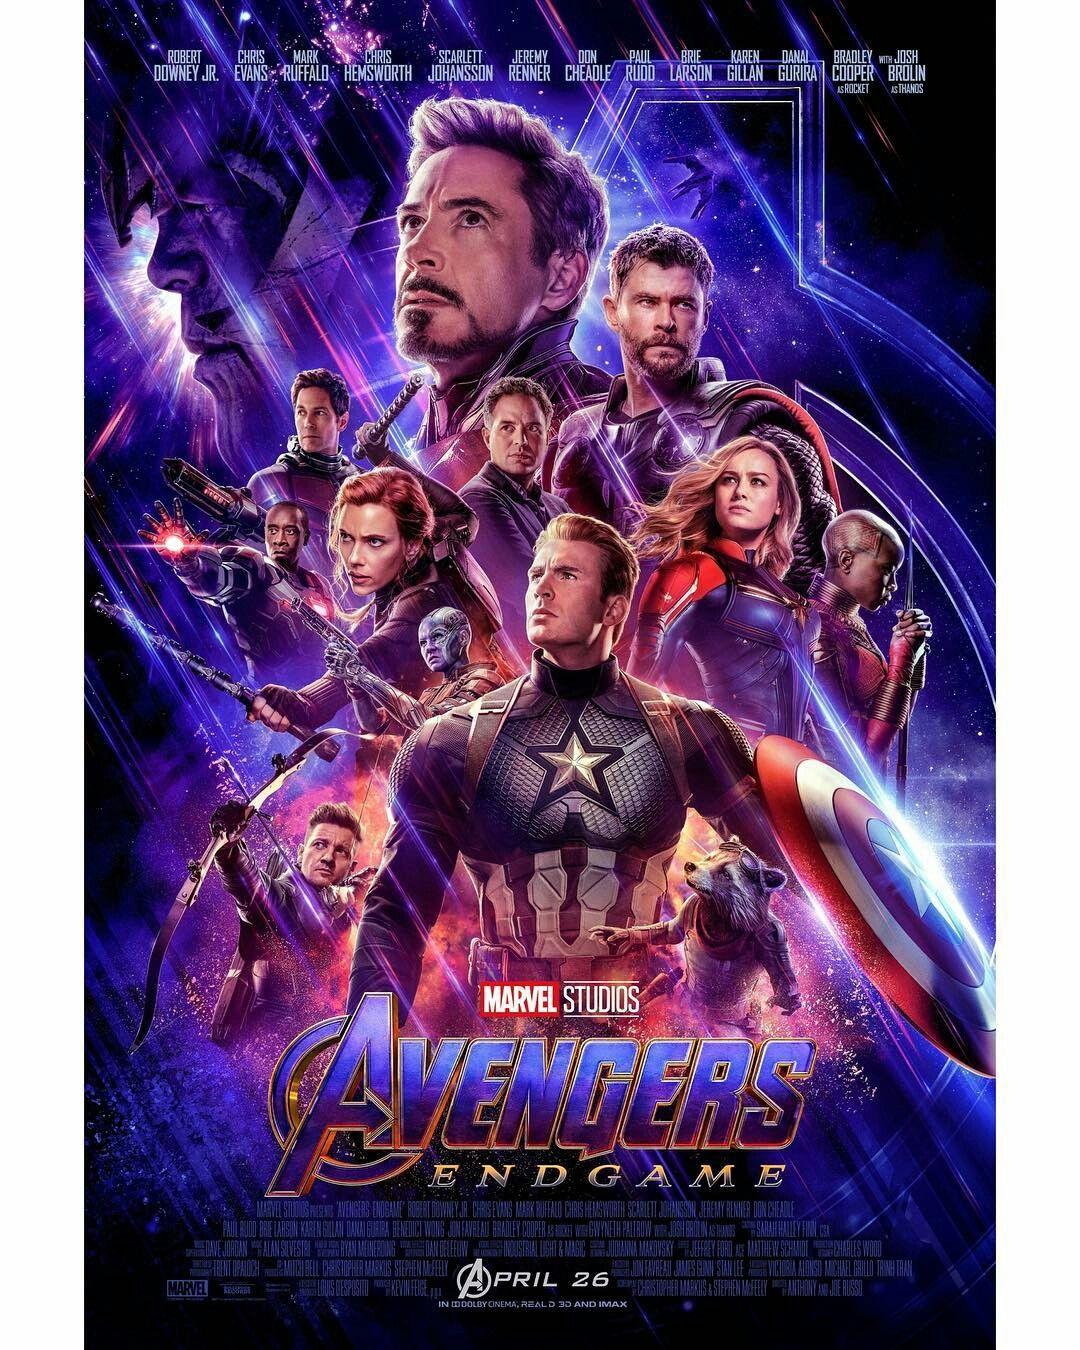 Pin De Prince Of All Saiyans En Marvel Cinametic Universe Peliculas De Superheroes Avengers Marvel